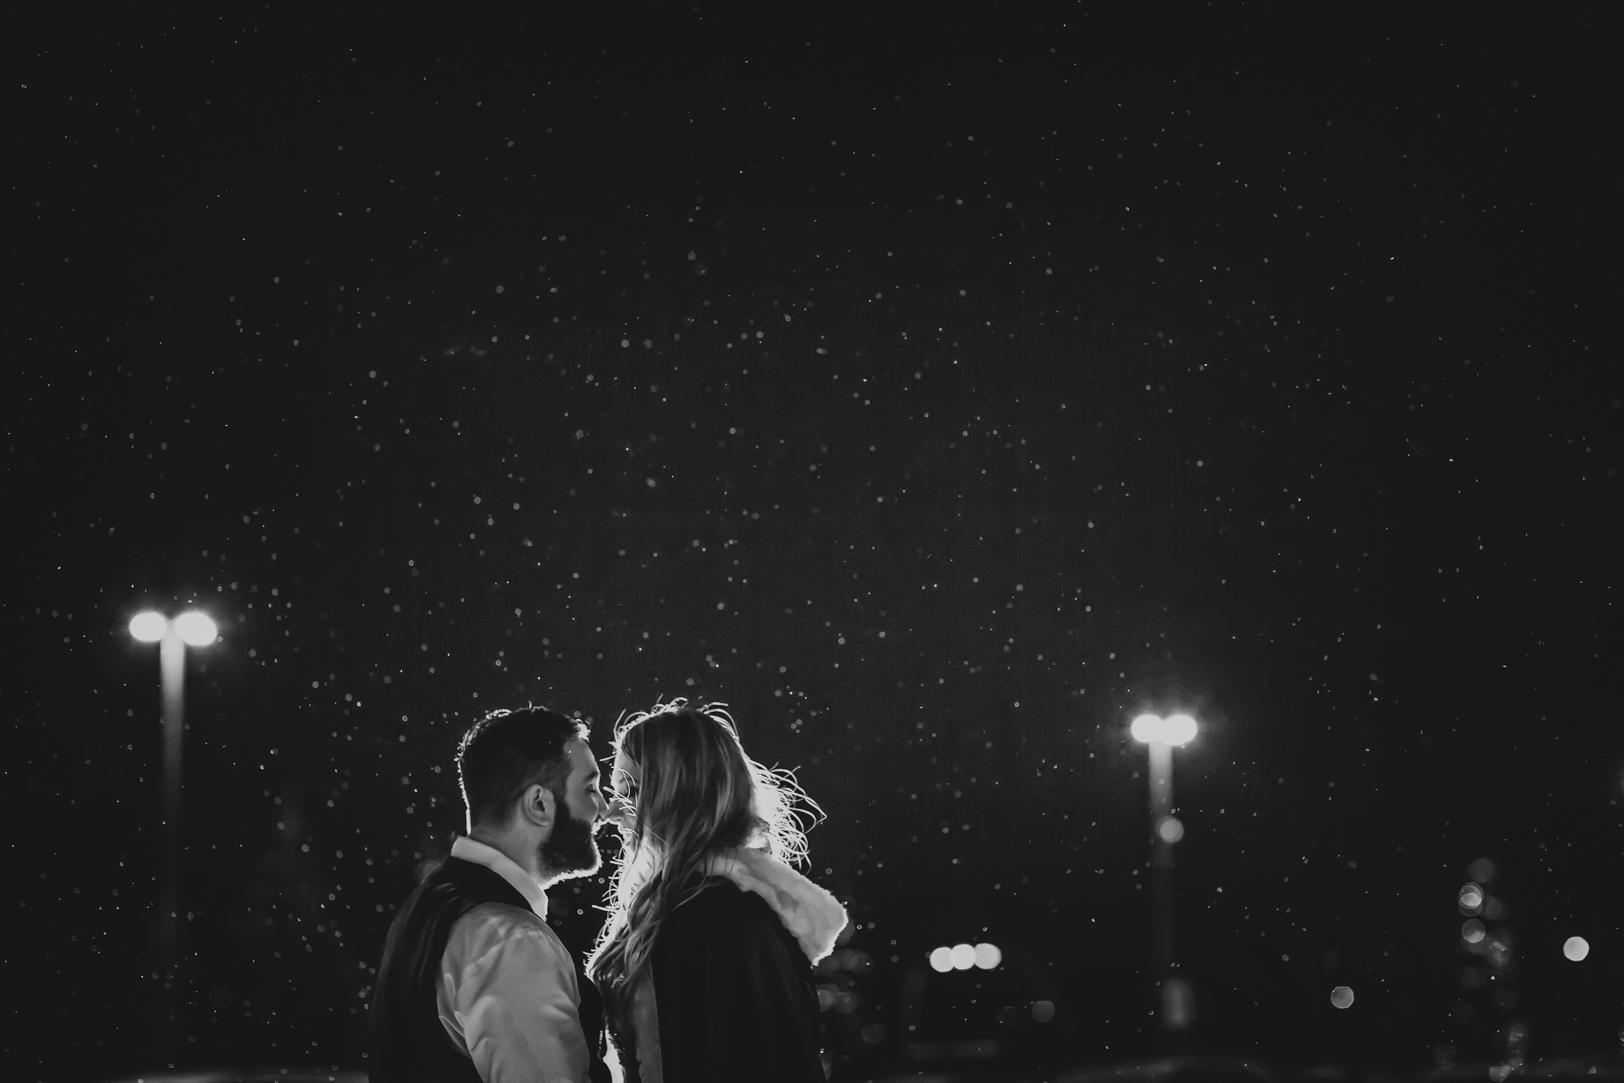 winter wedding photos edmonton - New Years Eve Wedding Edmonton